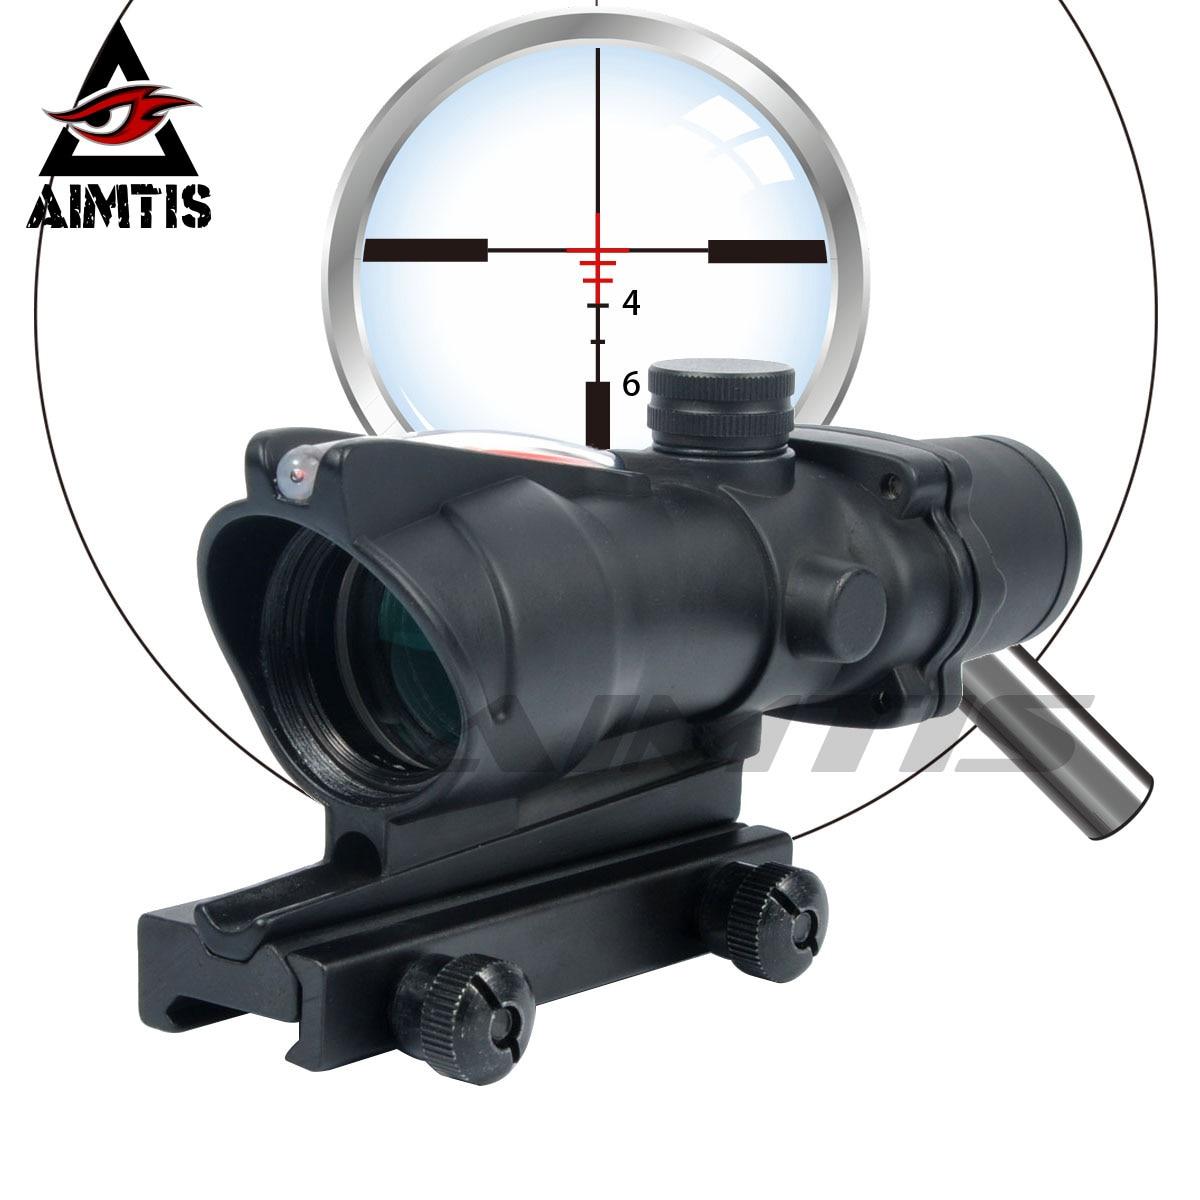 AIMTIS Verbesserte Jagd ACOG 308 4X32 Umfang Echt Optic Fiber Quelle Rot Grün Beleuchtet Scope Tactical Zielfernrohr für gewehr